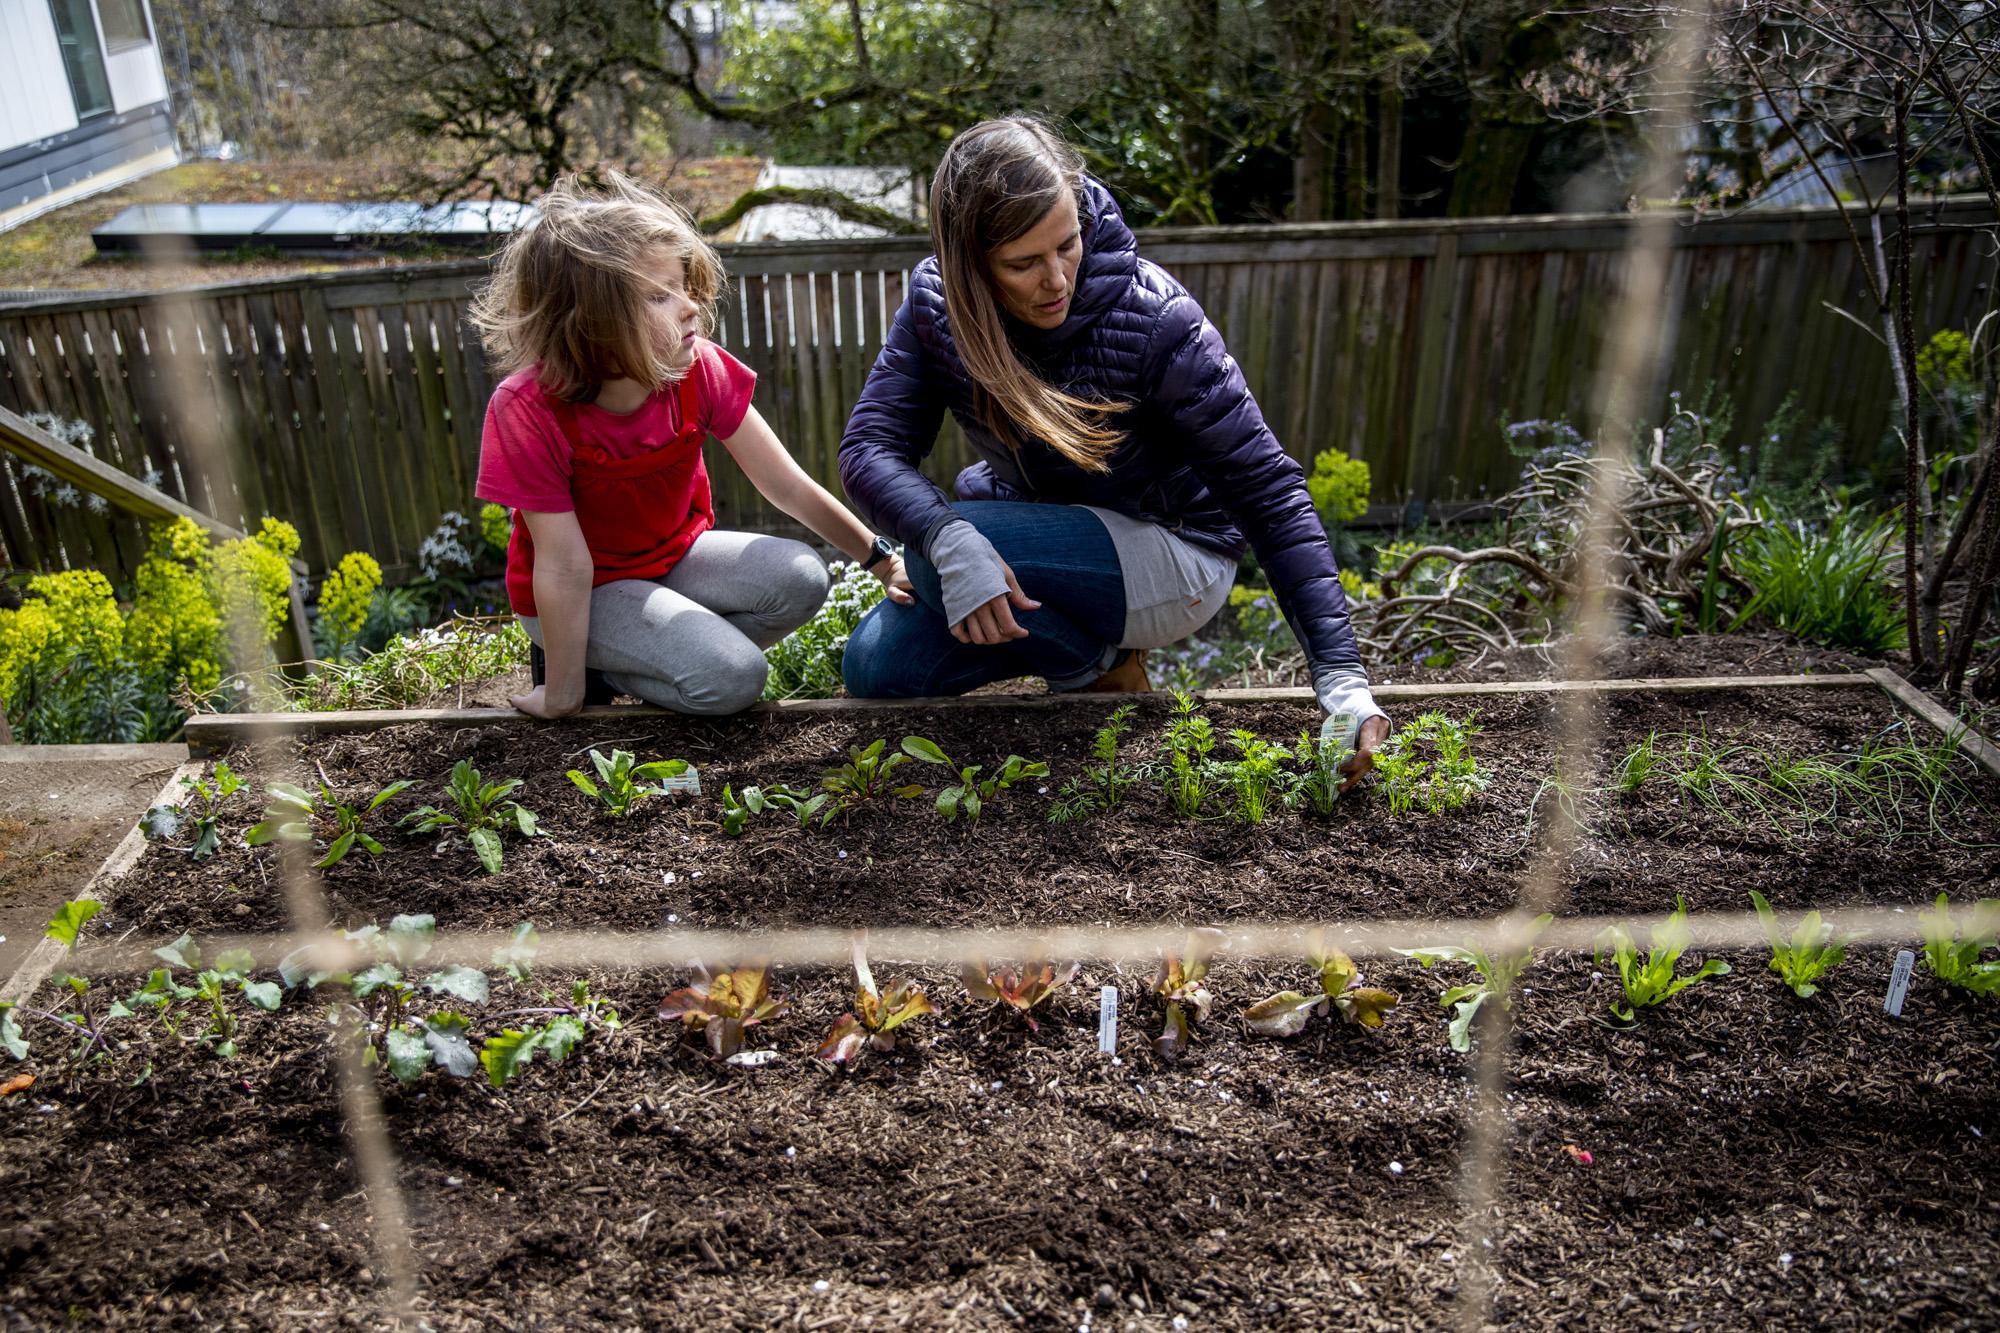 Wwii Era Victory Gardens Make A Comeback Amid Coronavirus Crosscut